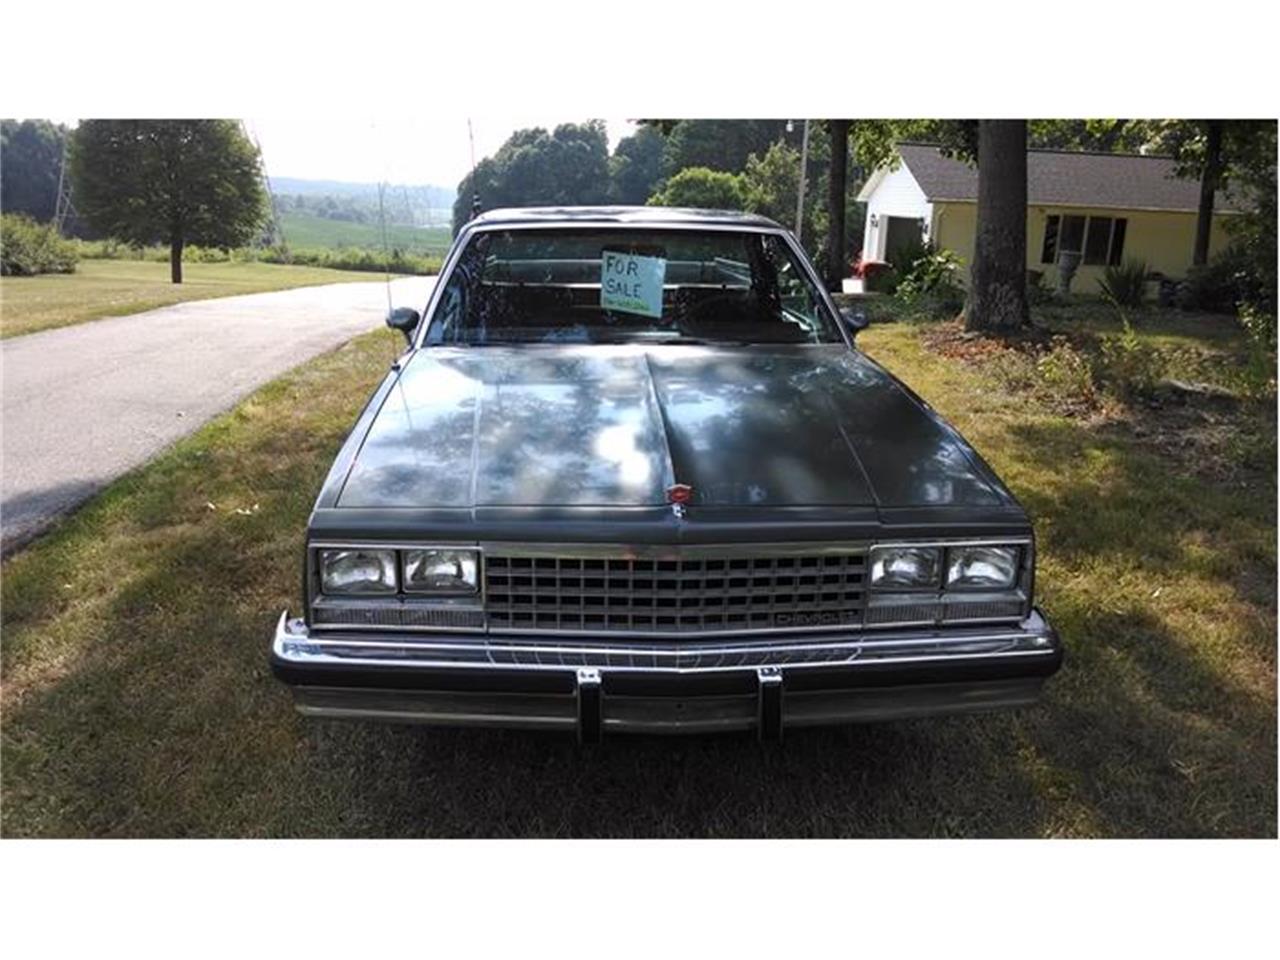 1985 Chevrolet El Camino (CC-109743) for sale in Lexington, North Carolina